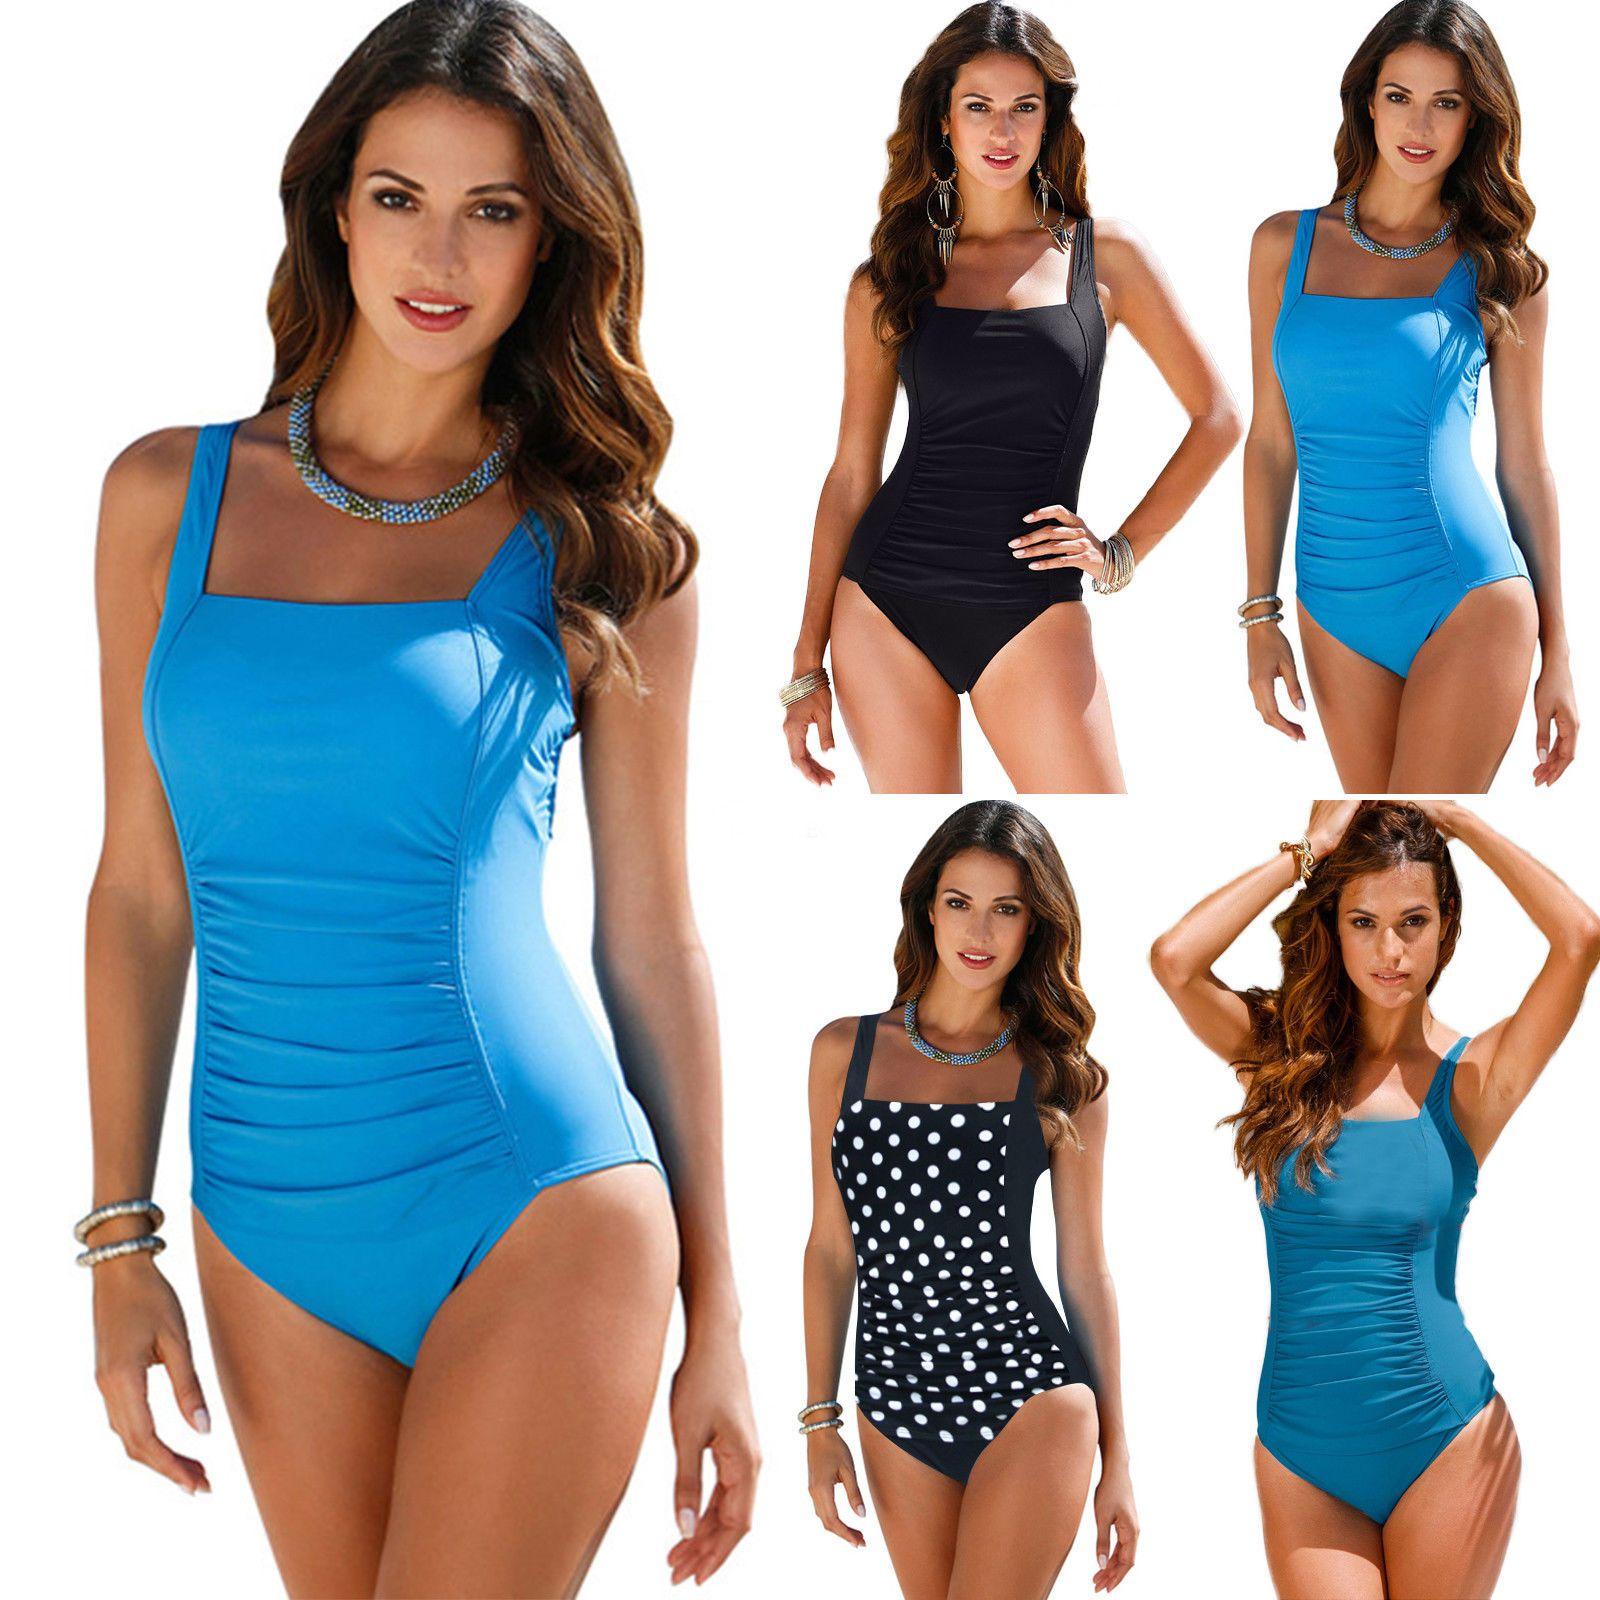 40ebf8d249 2019 US FAST SHIPPING 2018 Women One Piece Monokini Push Up Bikini Swimwear  Swimsuit Padded Bathing Suit Plus Size From Plazahere